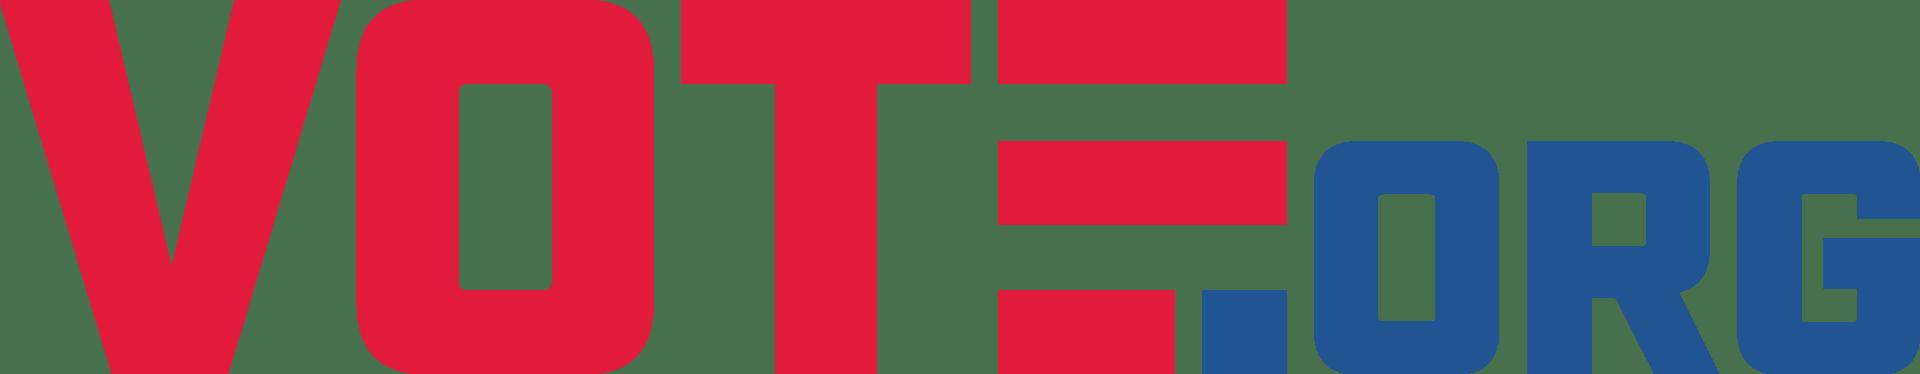 Vote Dot Org logo